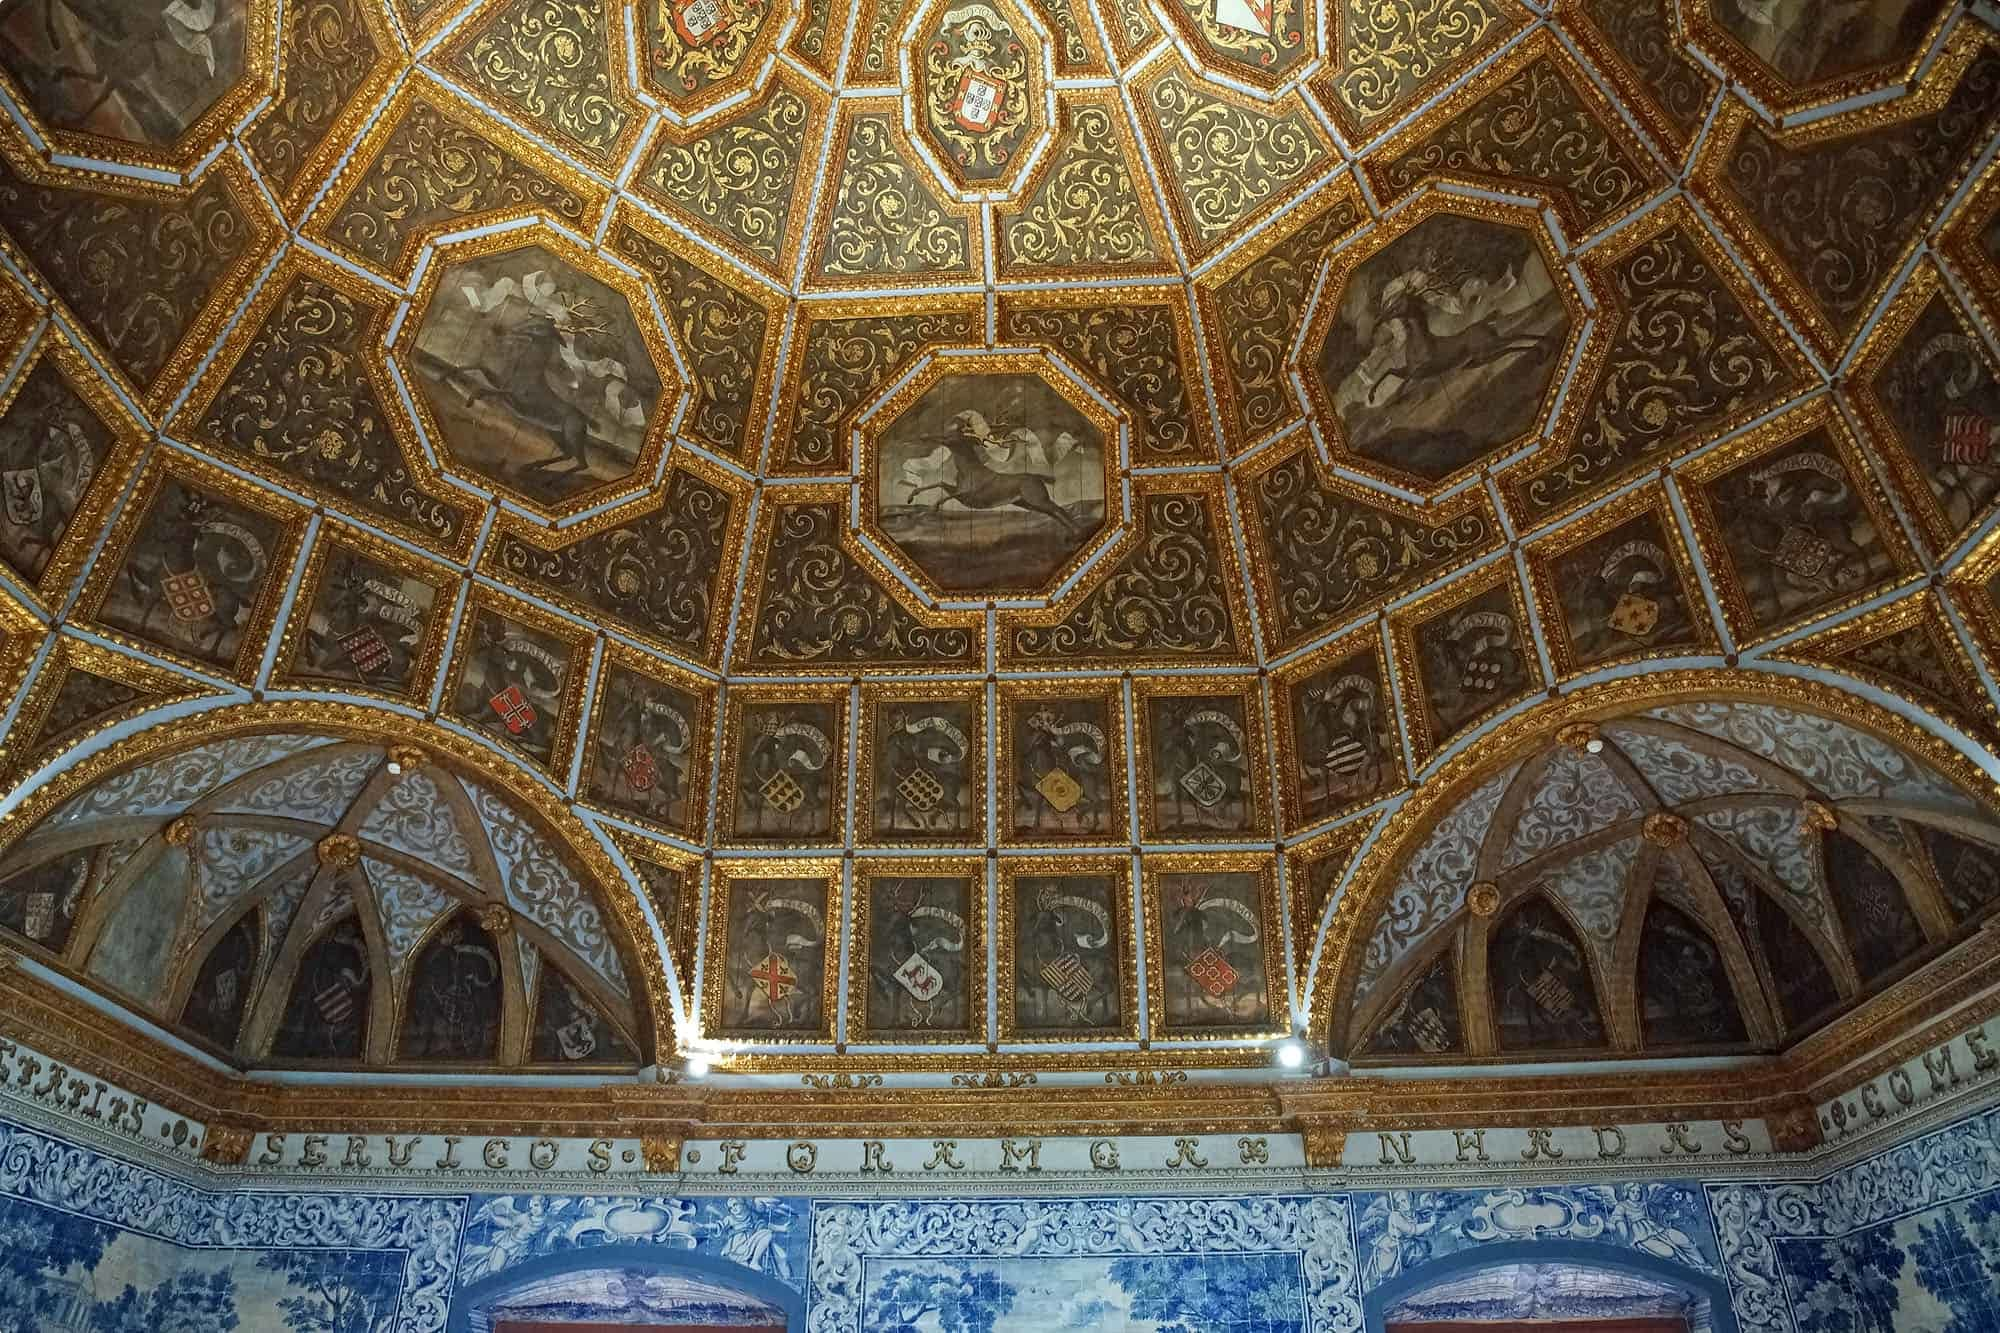 The inside of the Palacio Nacional de Sintra (The National Palace of Sintra)